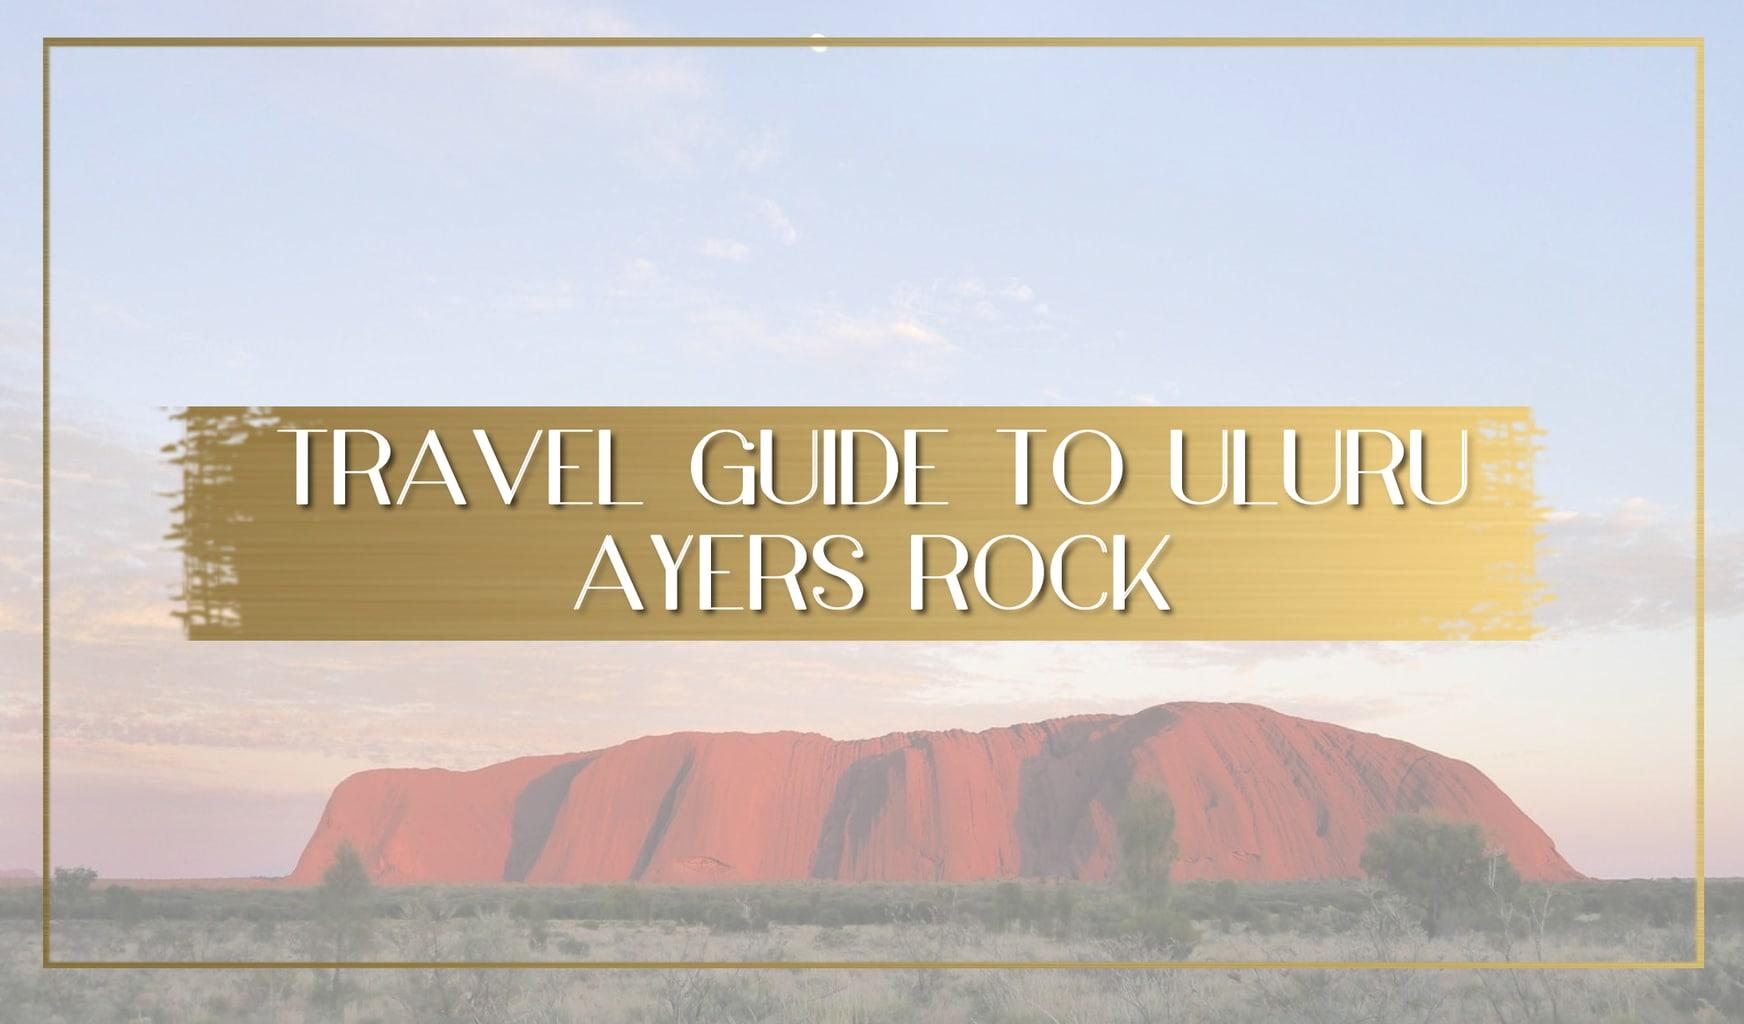 Travel Guide to Uluru Ayers Rock main